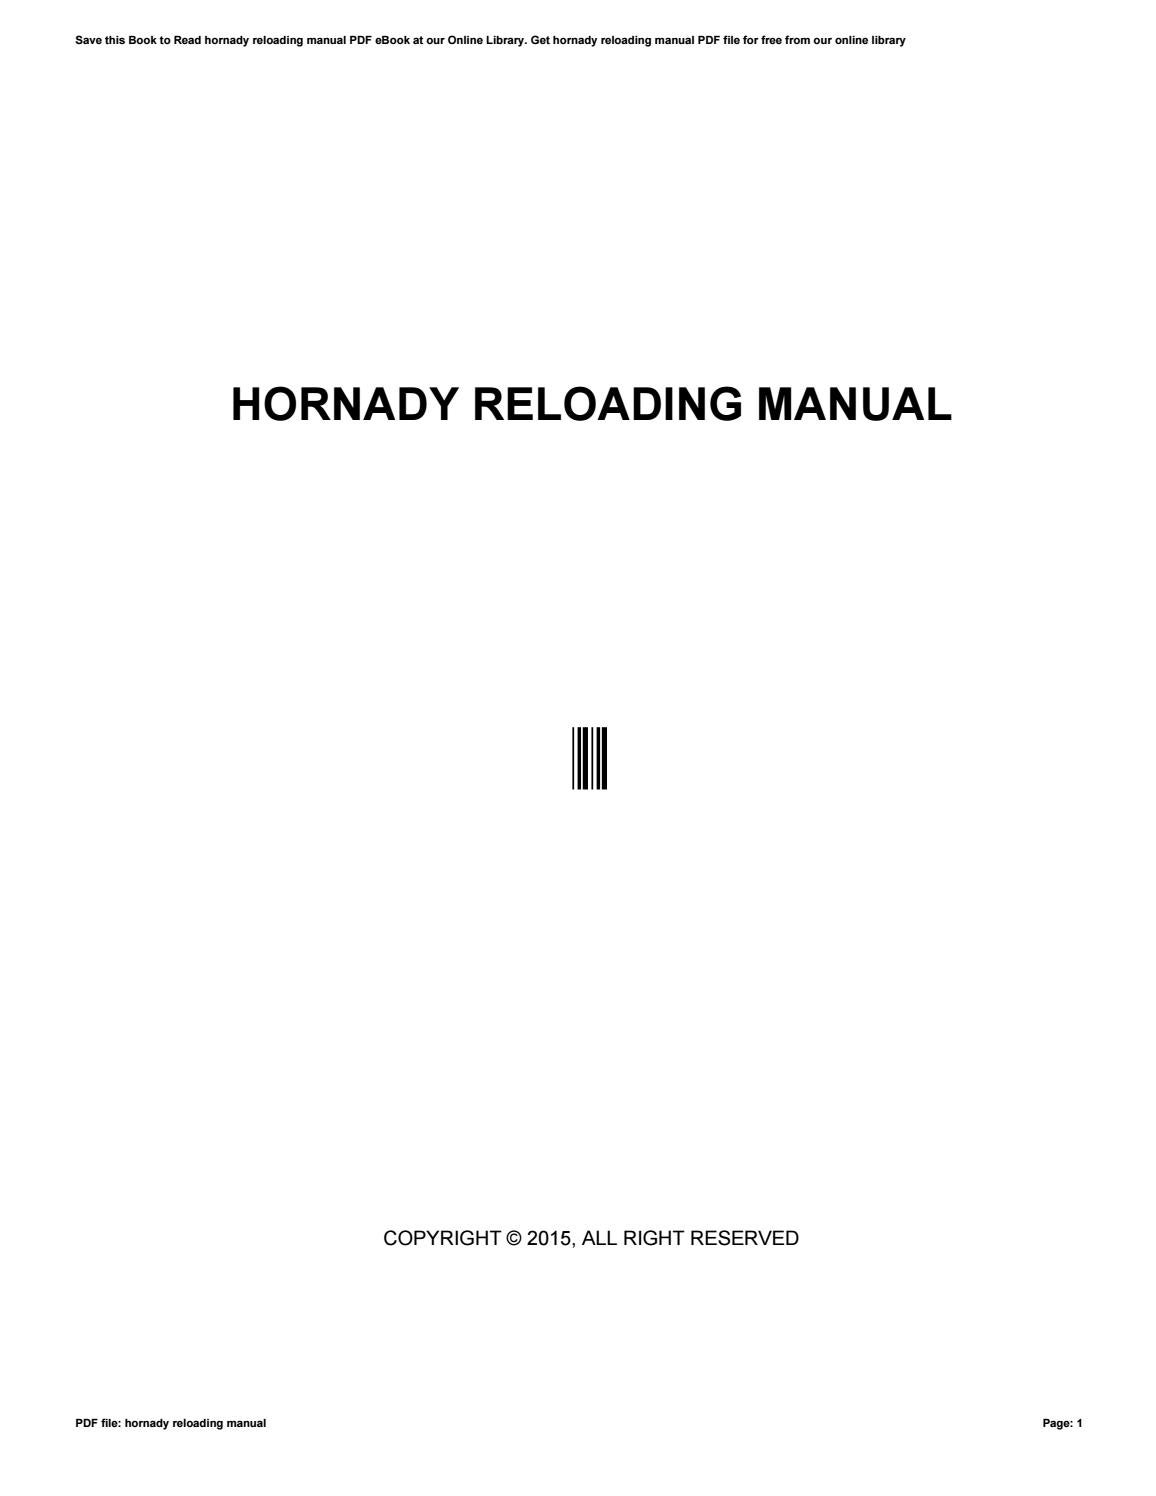 Hornady reloading manual by viresa34rdha - issuu